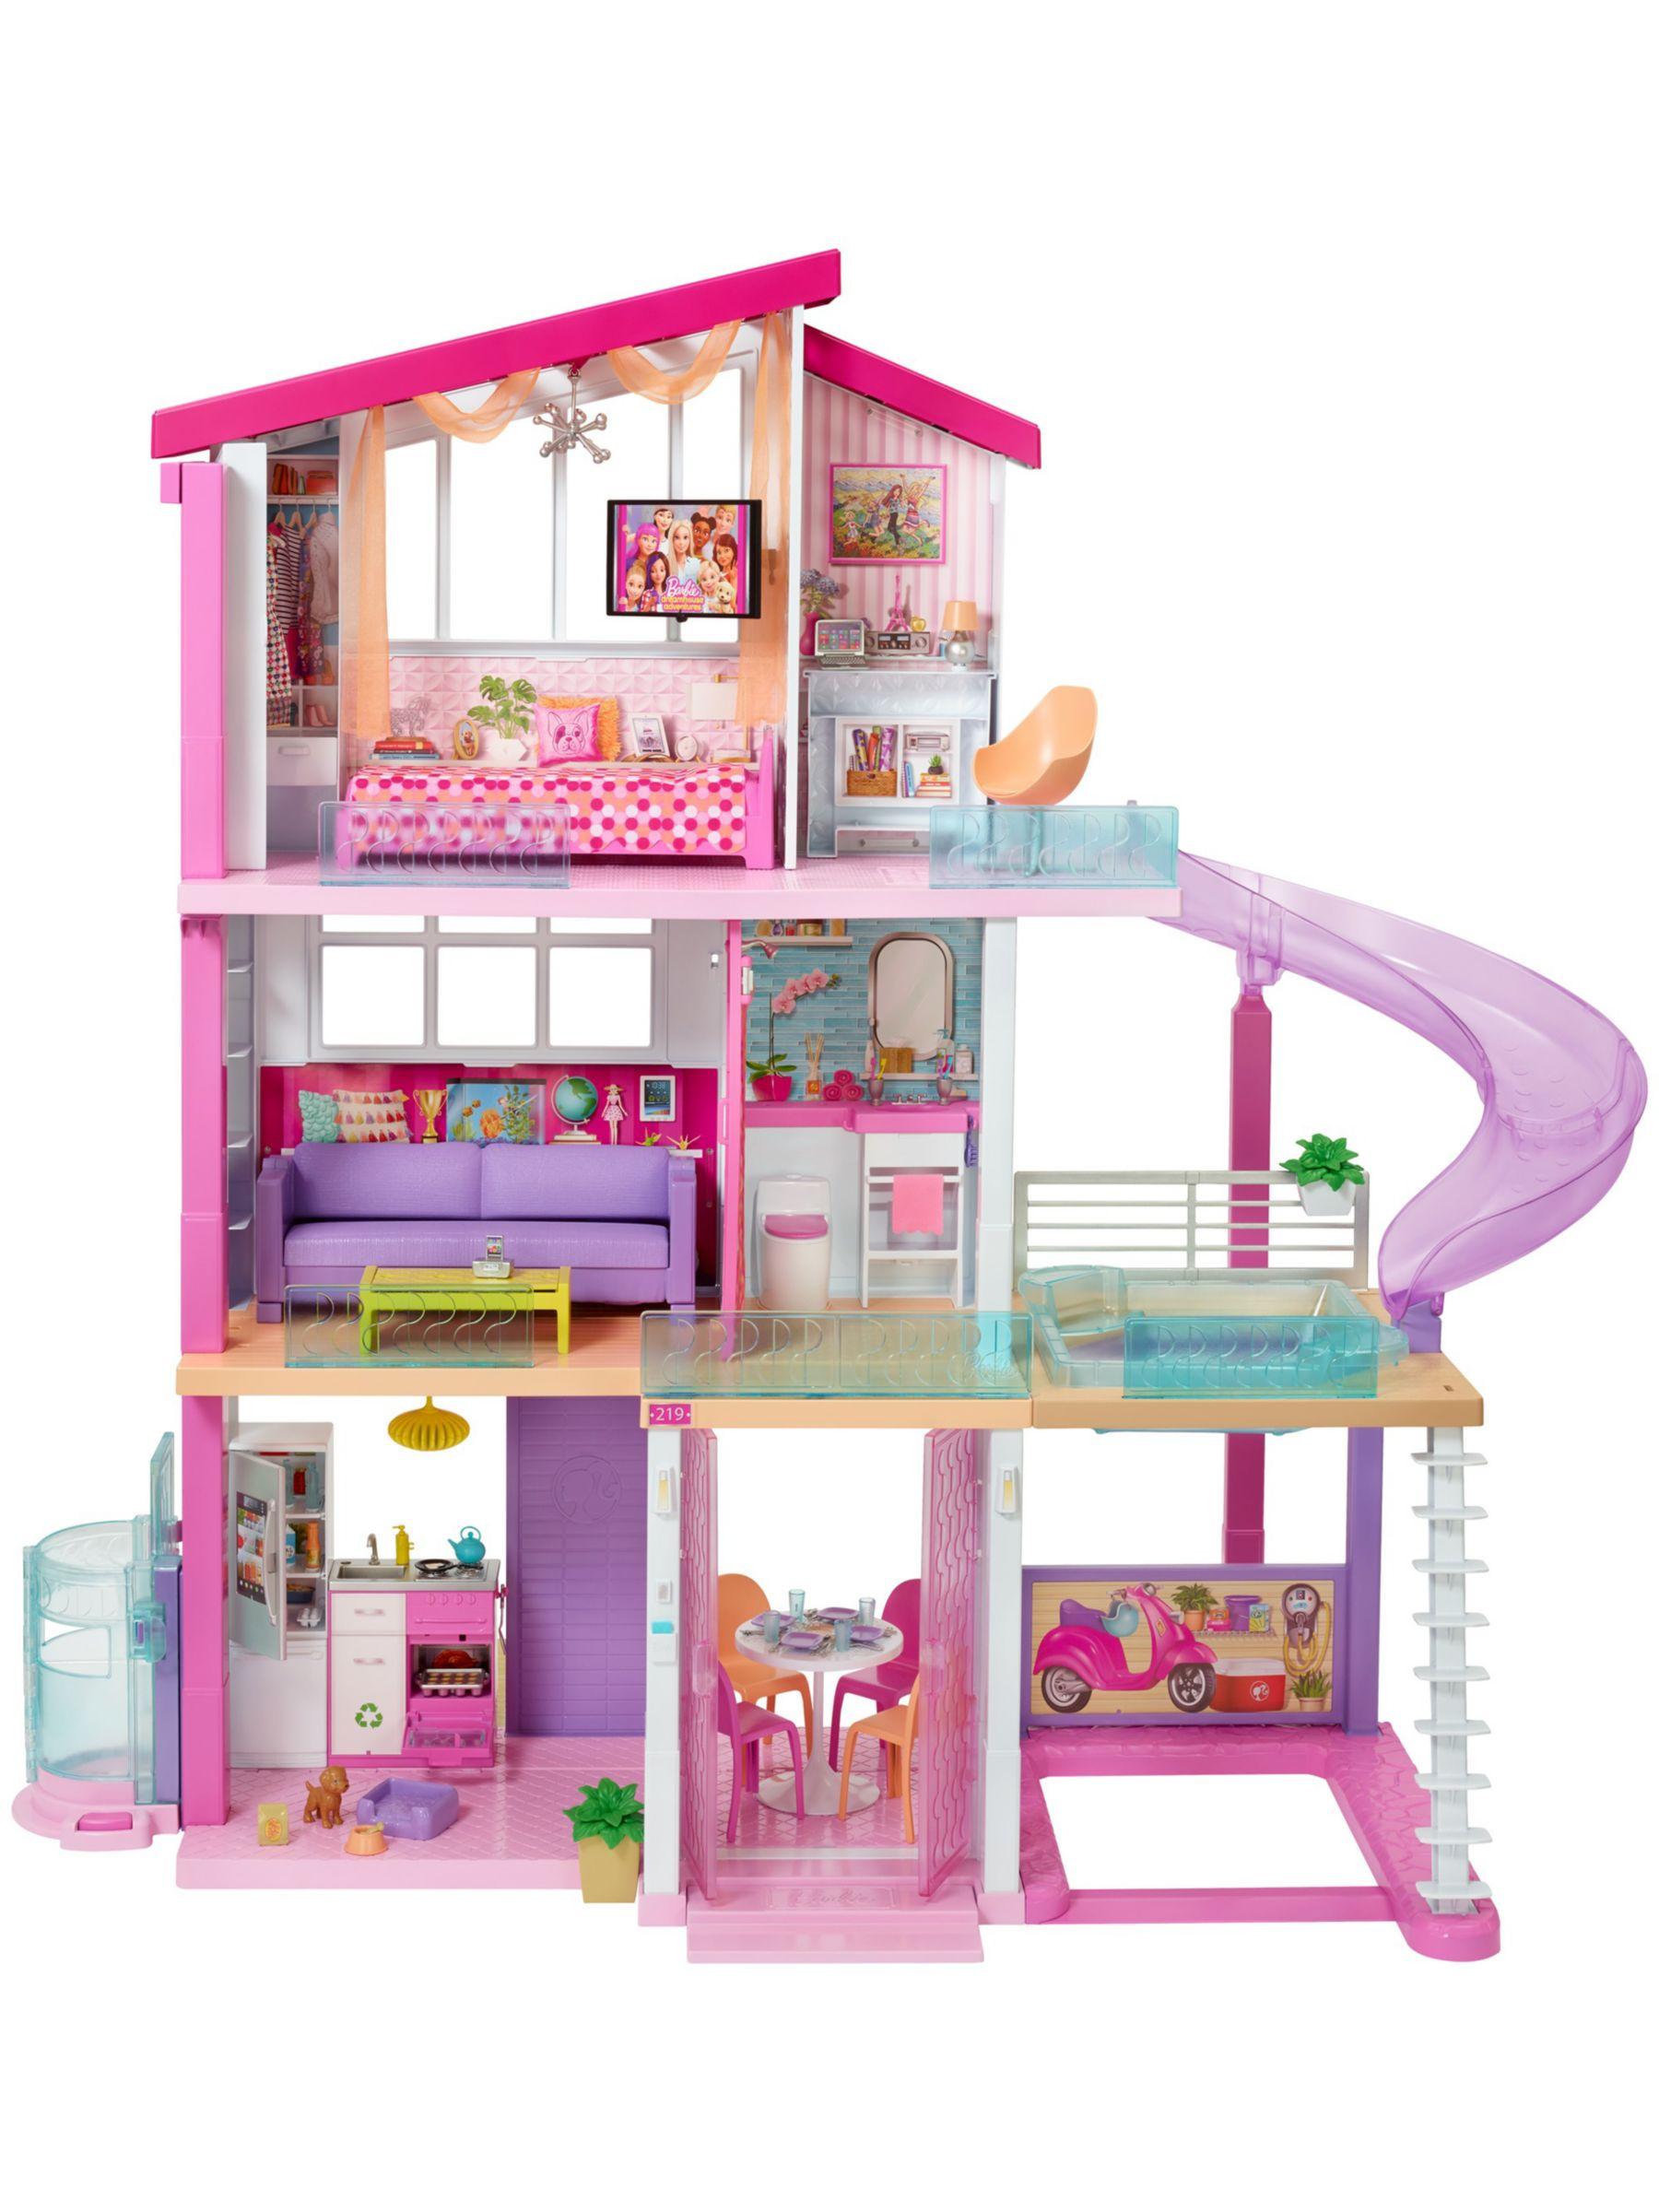 Barbie Barbie Dreamhouse With Slide